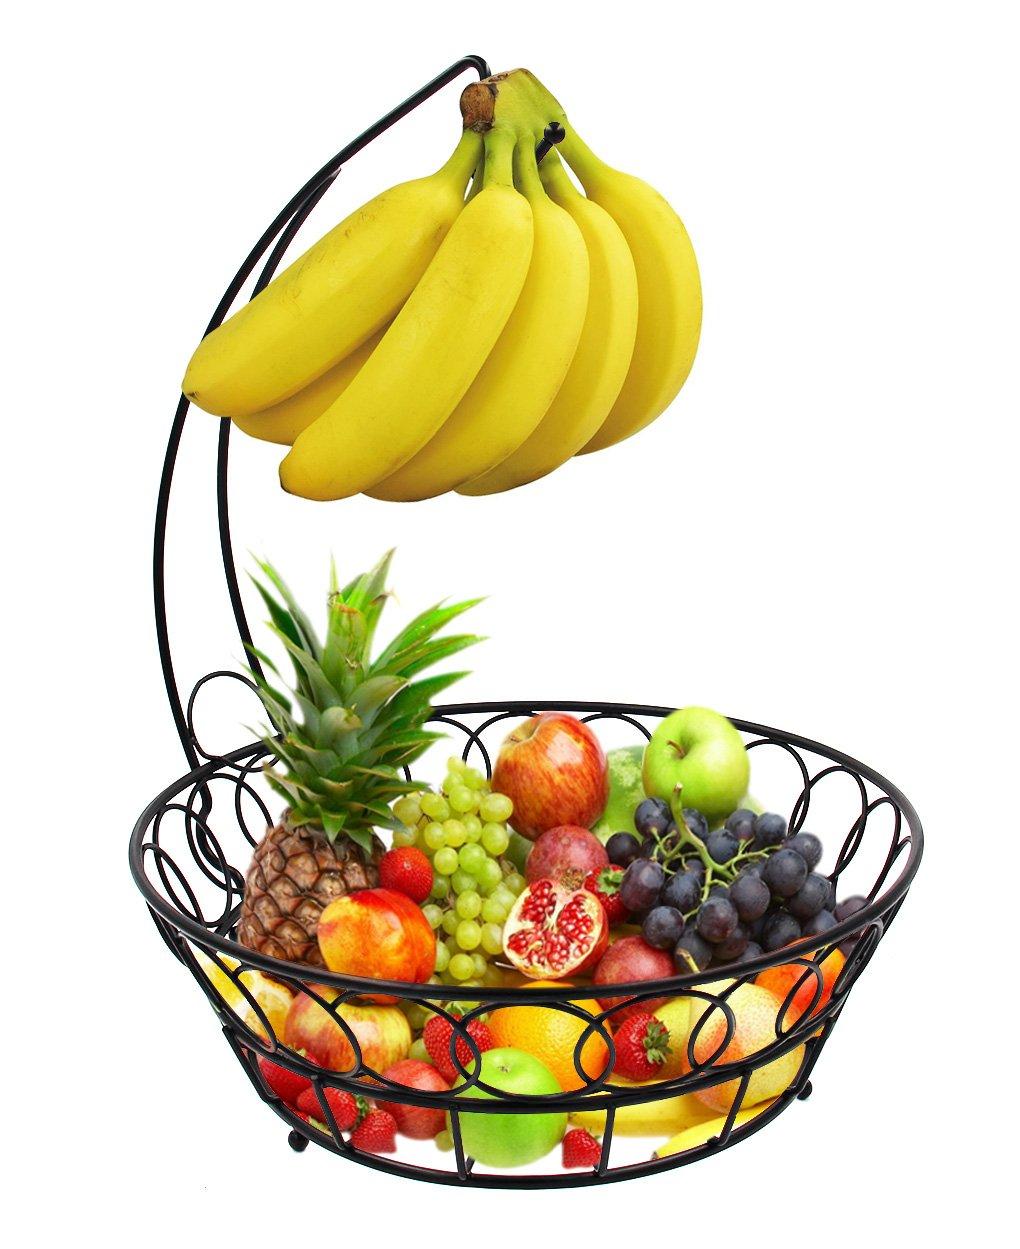 esylife fruit baskets stand wire basket with banana hanger. Black Bedroom Furniture Sets. Home Design Ideas